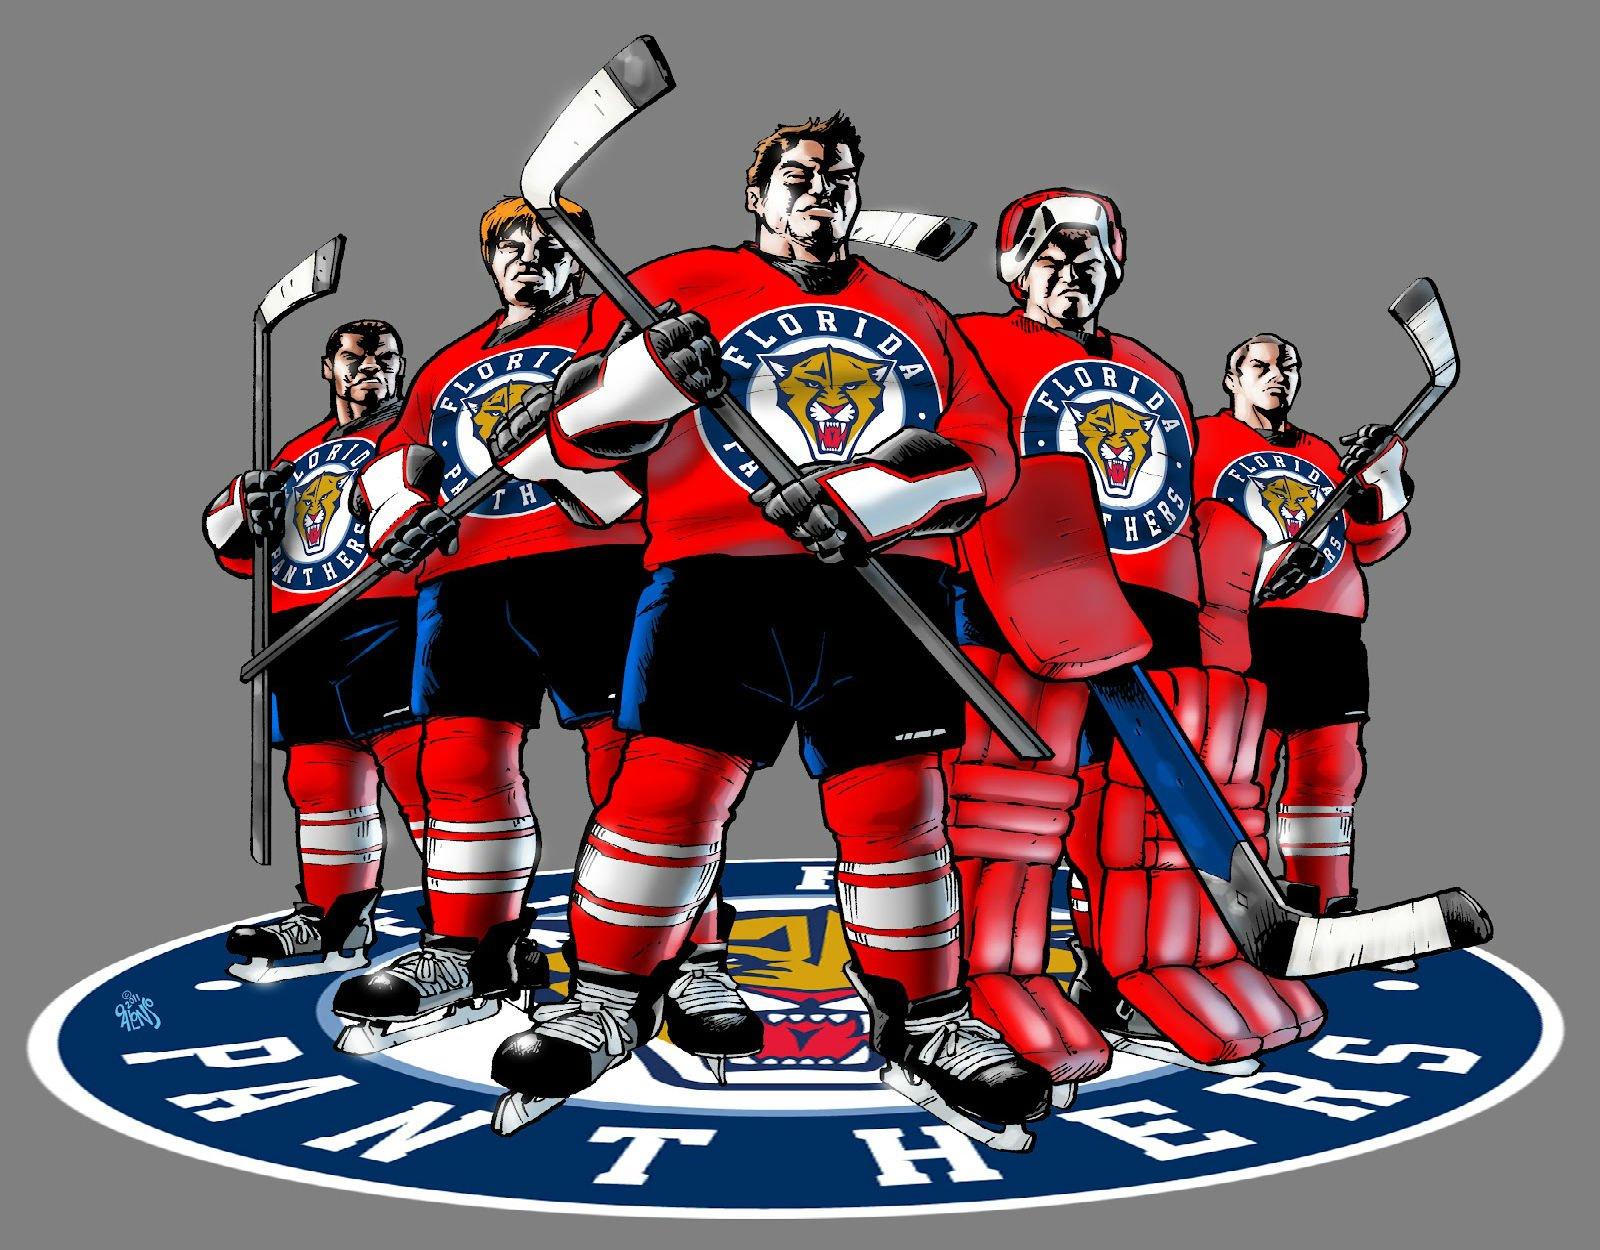 FLORIDA PANTHERS nhl hockey 13 wallpaper 1600x1250 343258 1600x1250